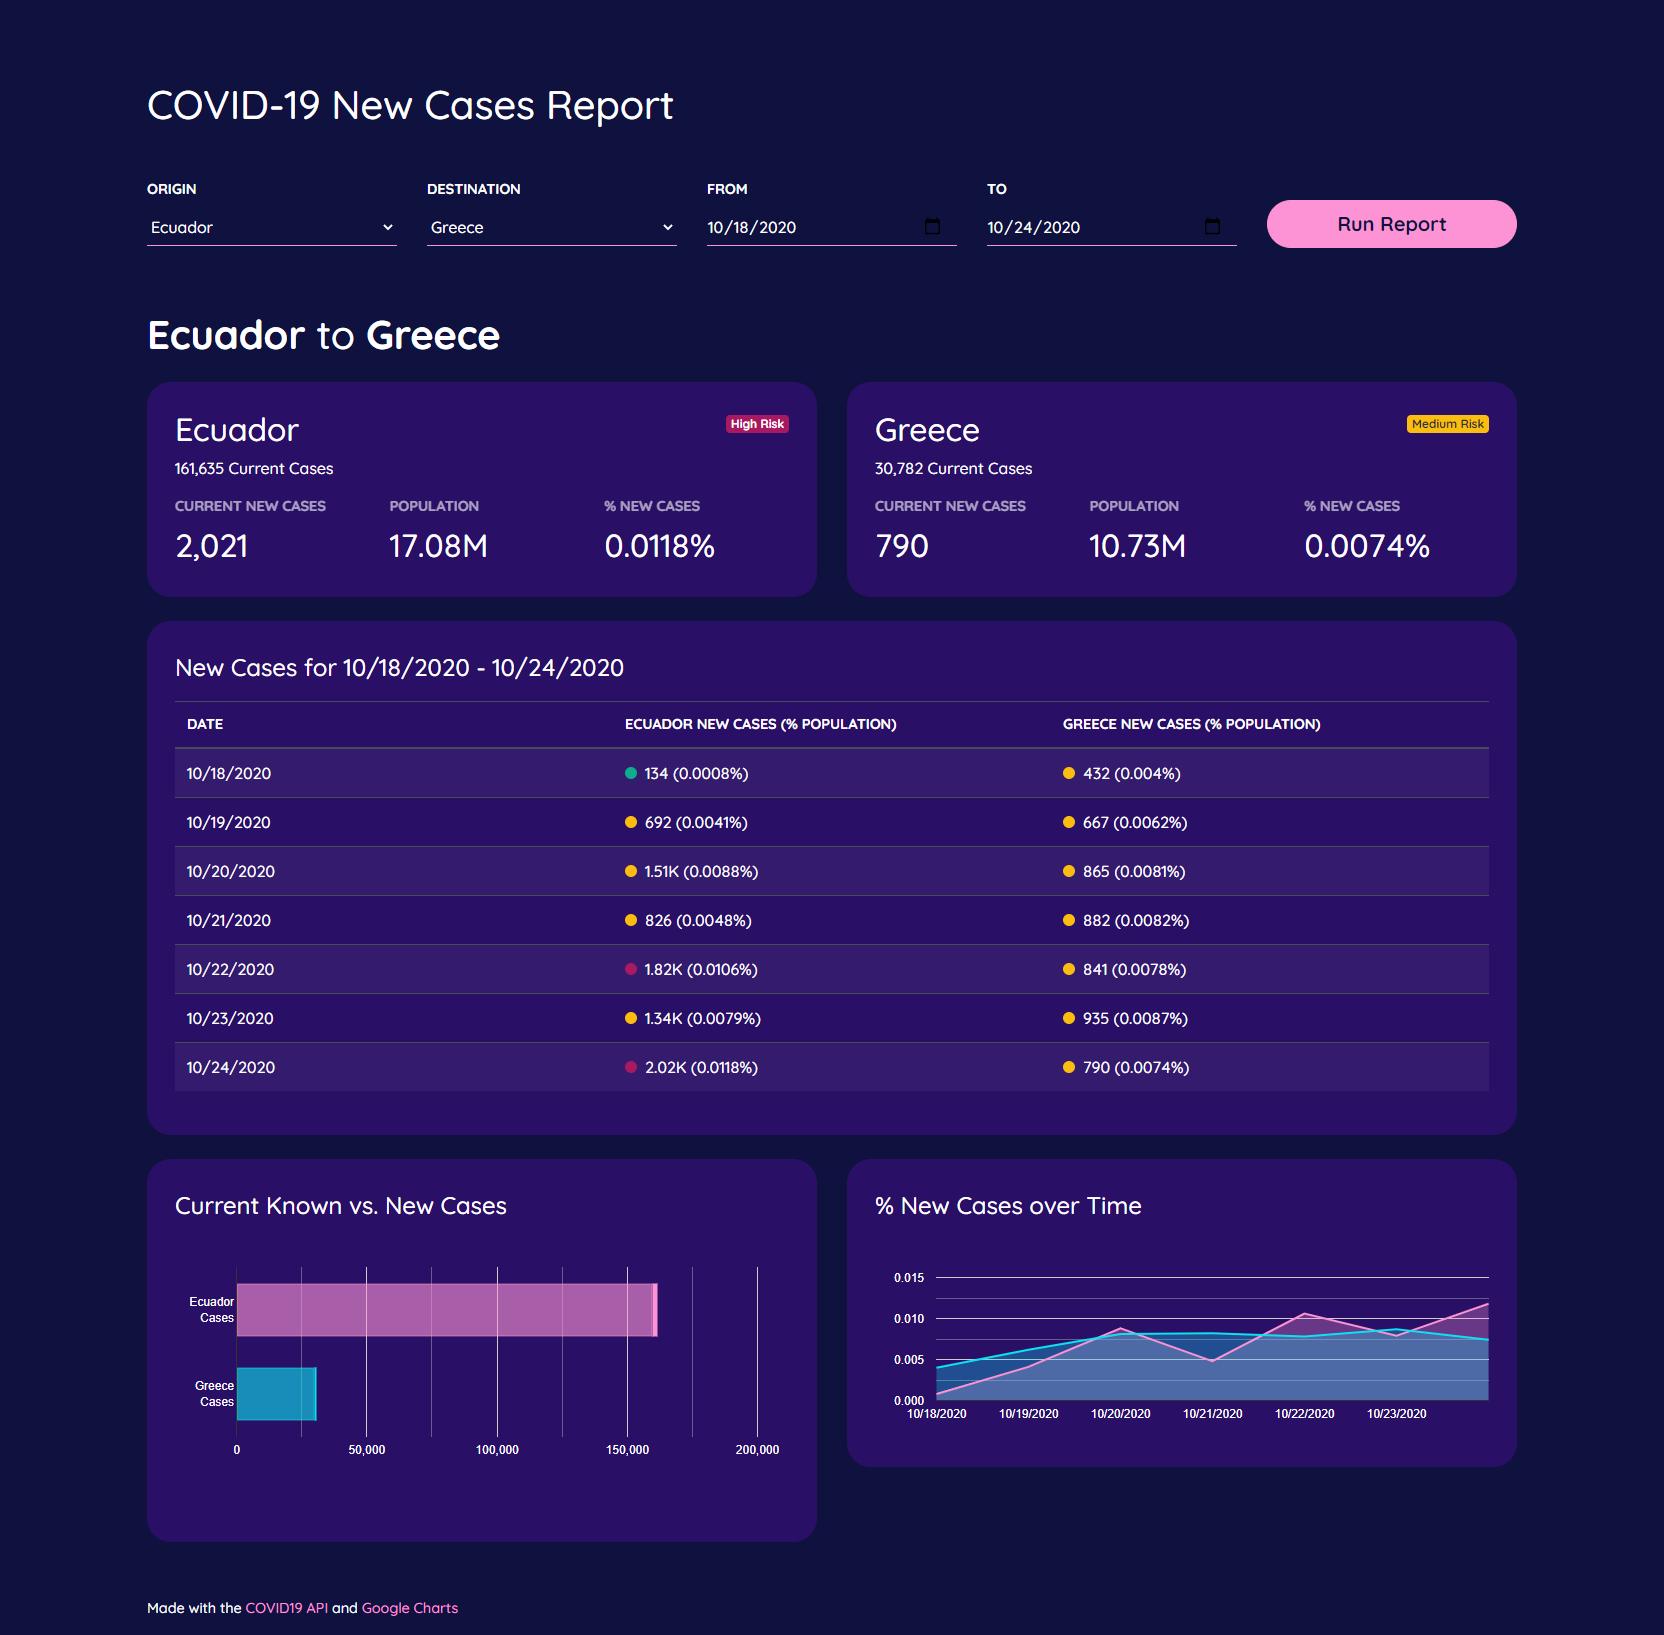 COVID-19 New Cases Report - Report